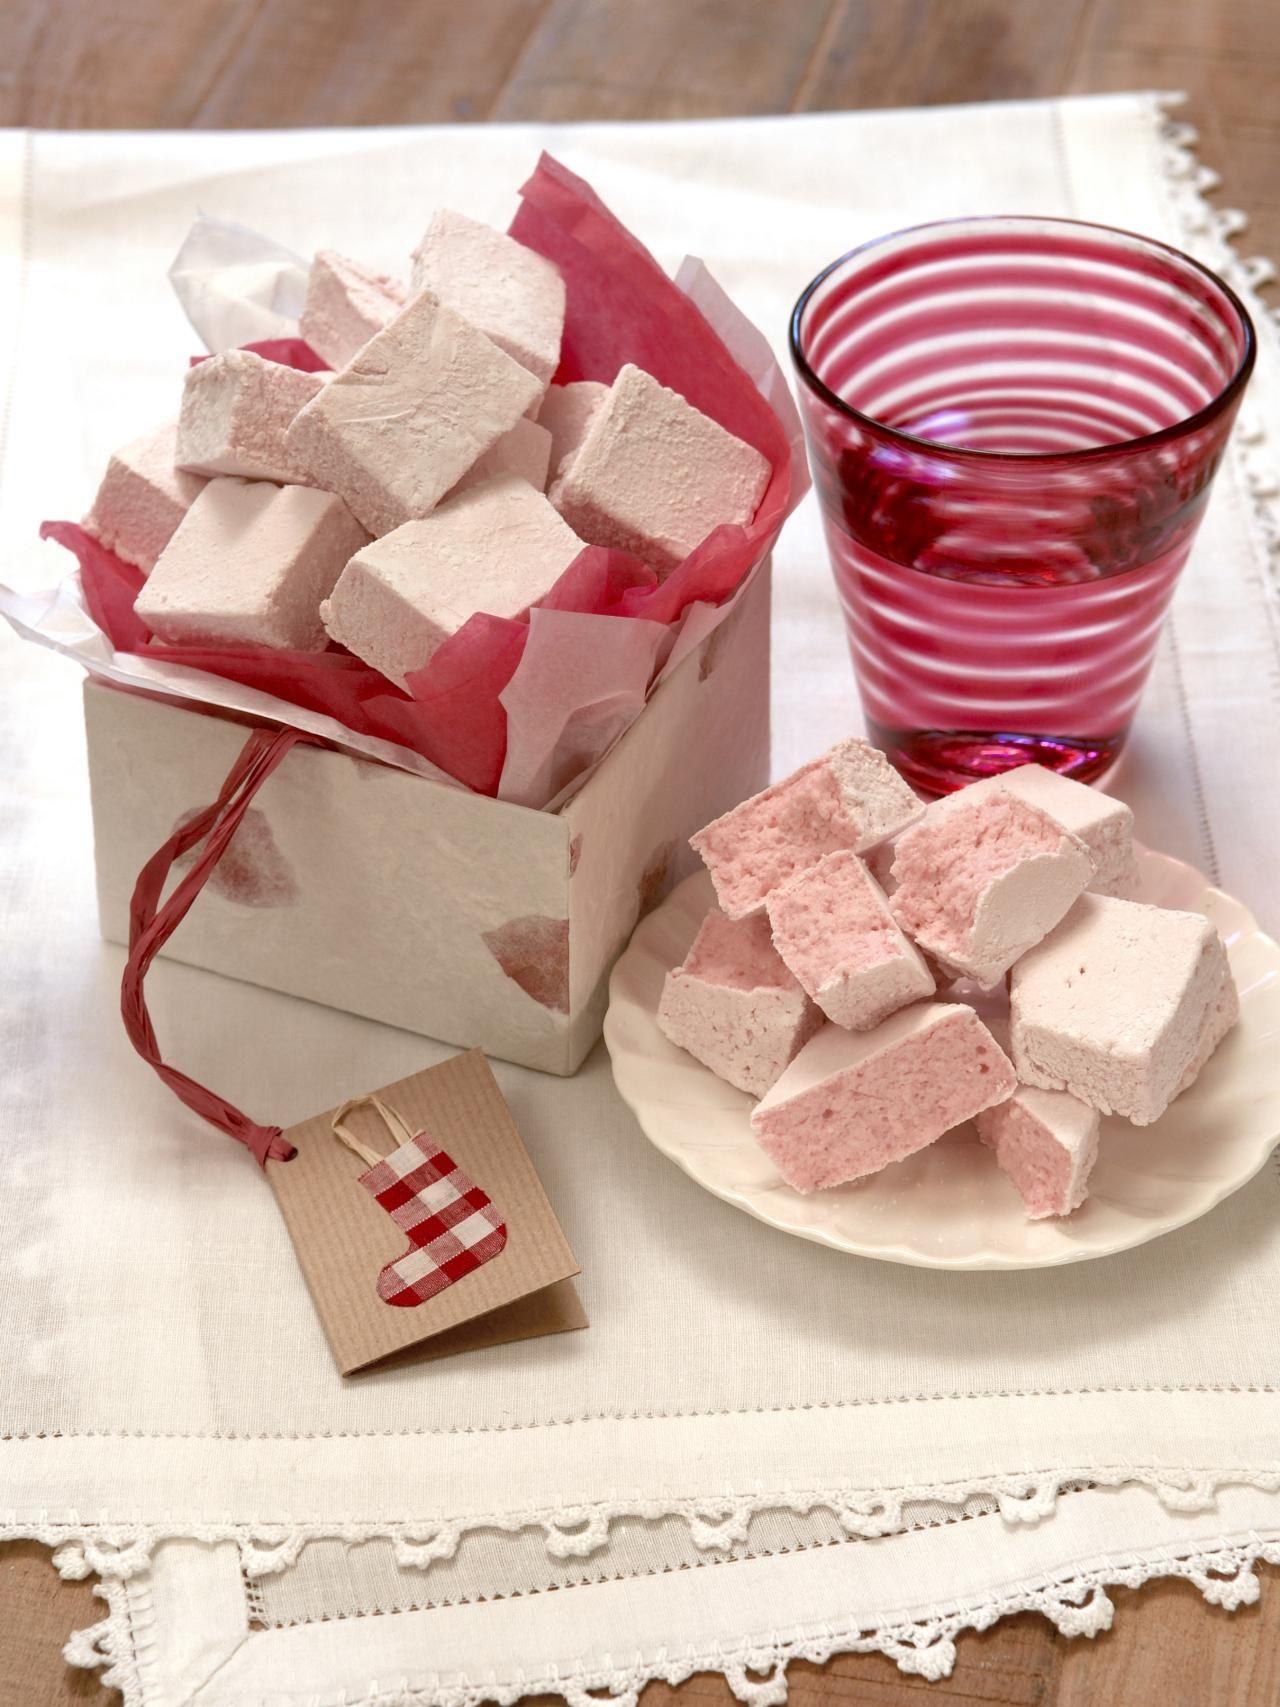 36 Homemade Holiday Food Gift Recipes   Christmas Decor and Gifts ...